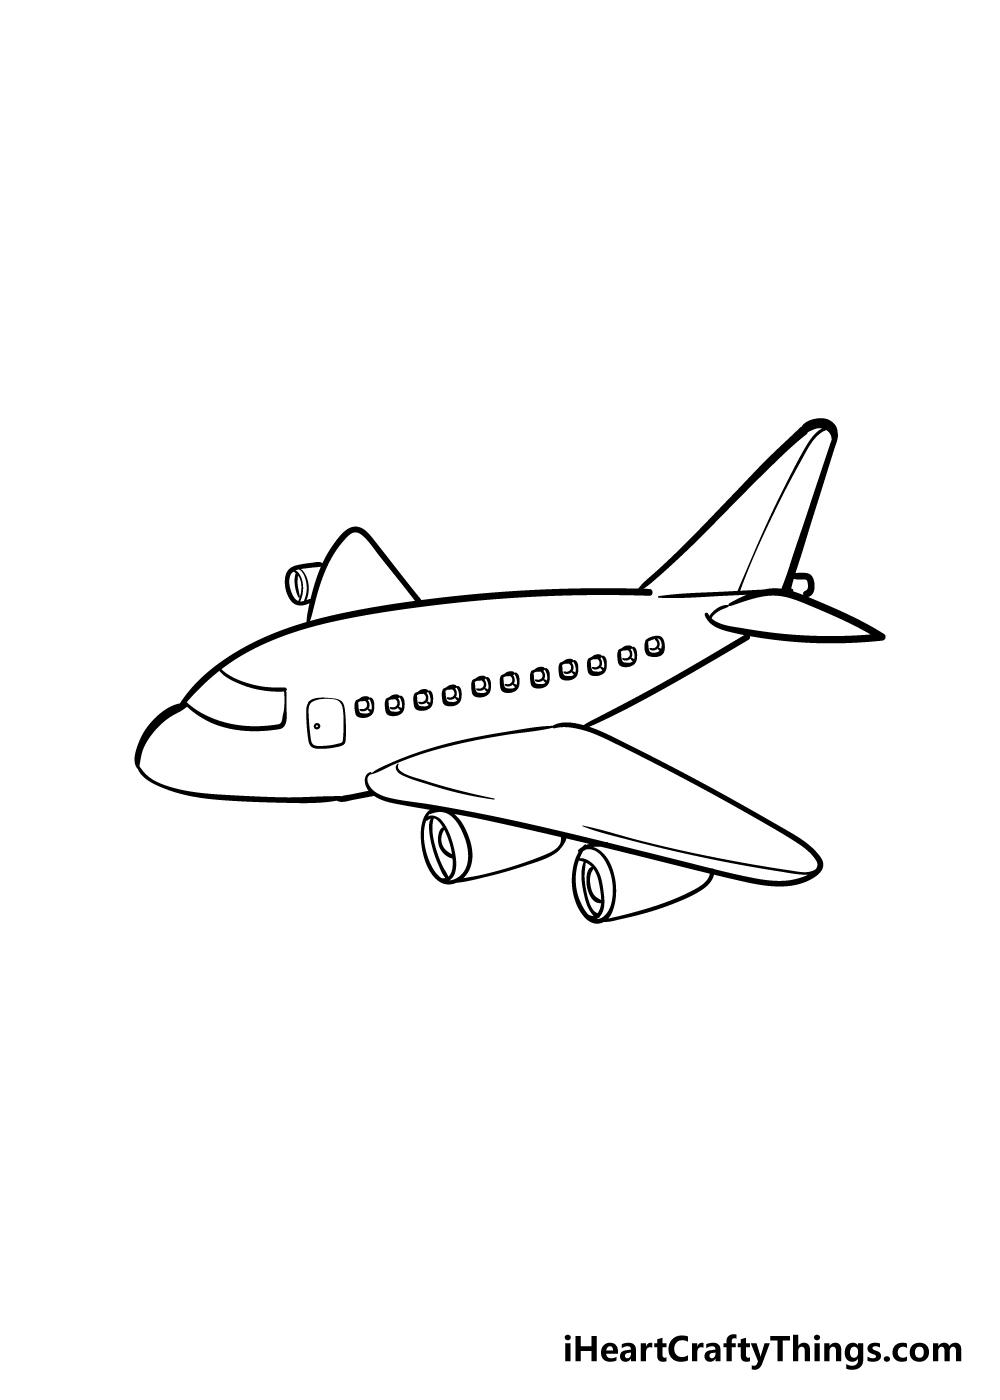 airplane drawing step 6